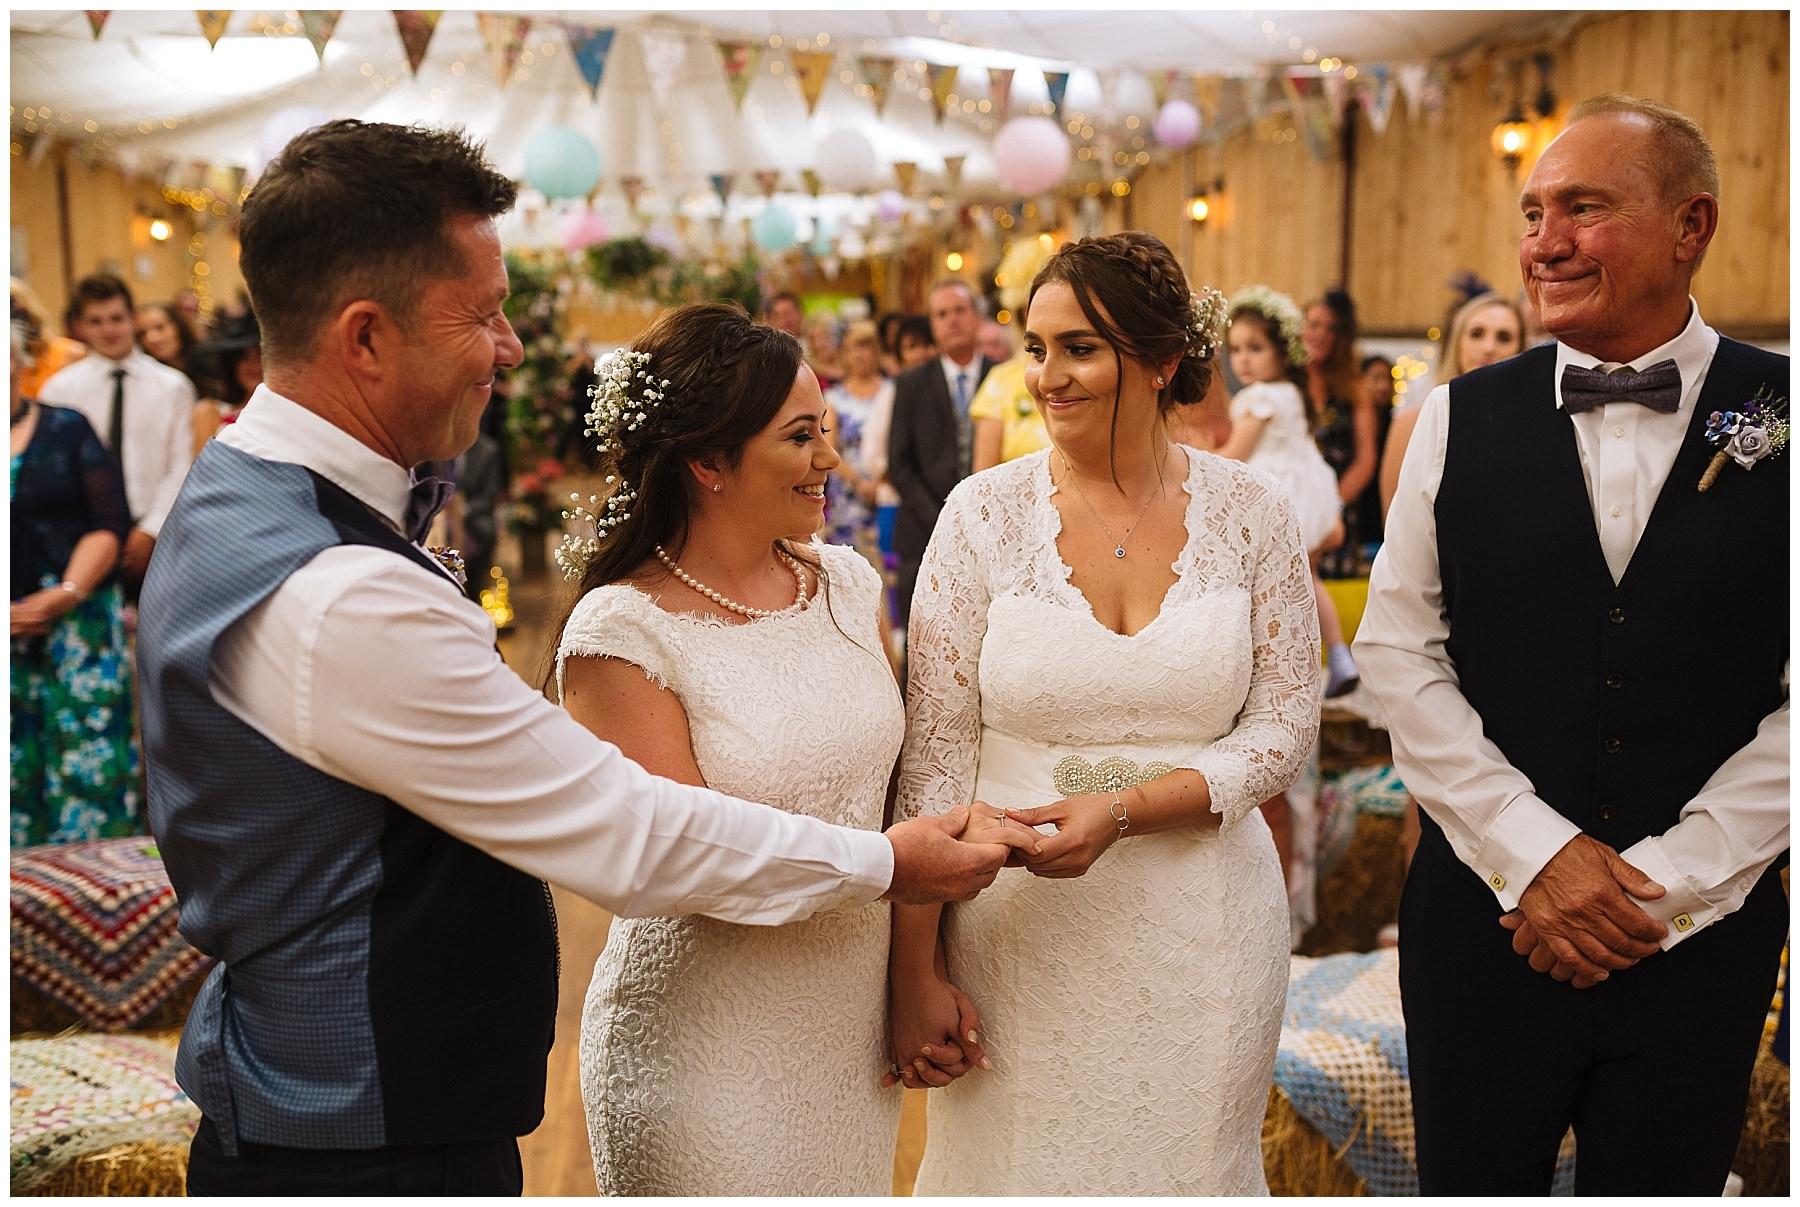 proud fathers exchange brides hands during wedding ceremony